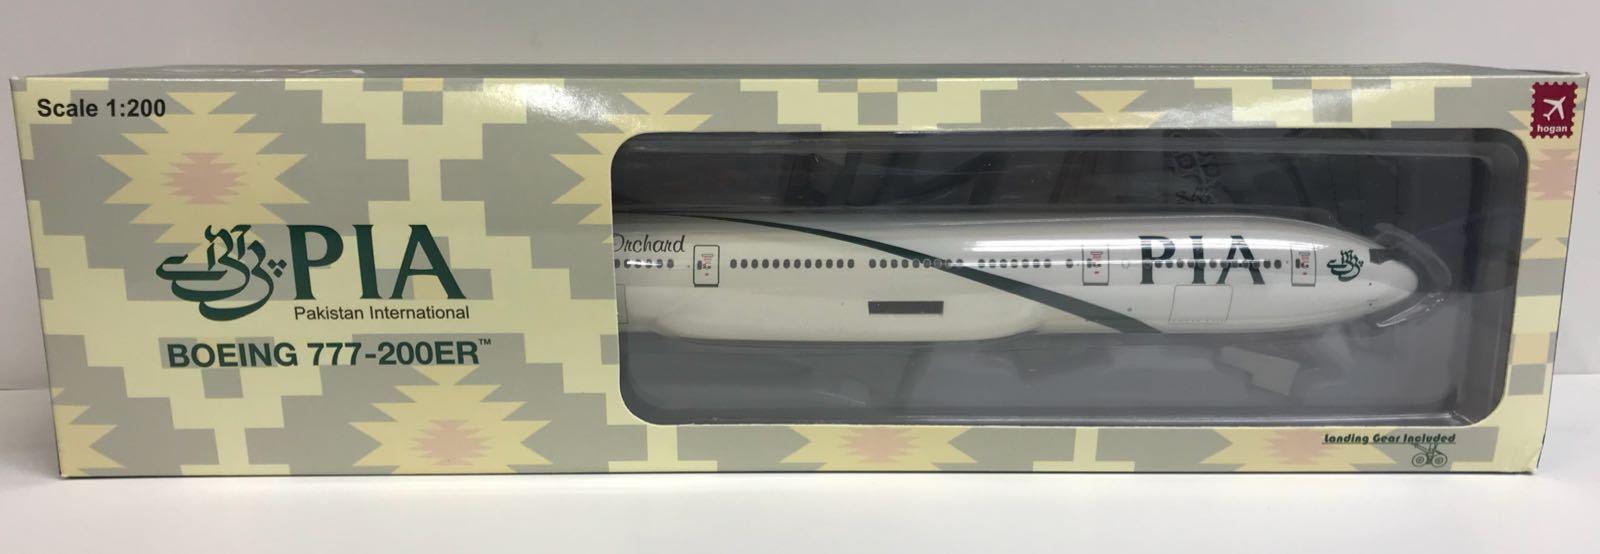 Hogan Wings 4814, Boeing B777-200ER, Pakistan International (PIA), 1 200